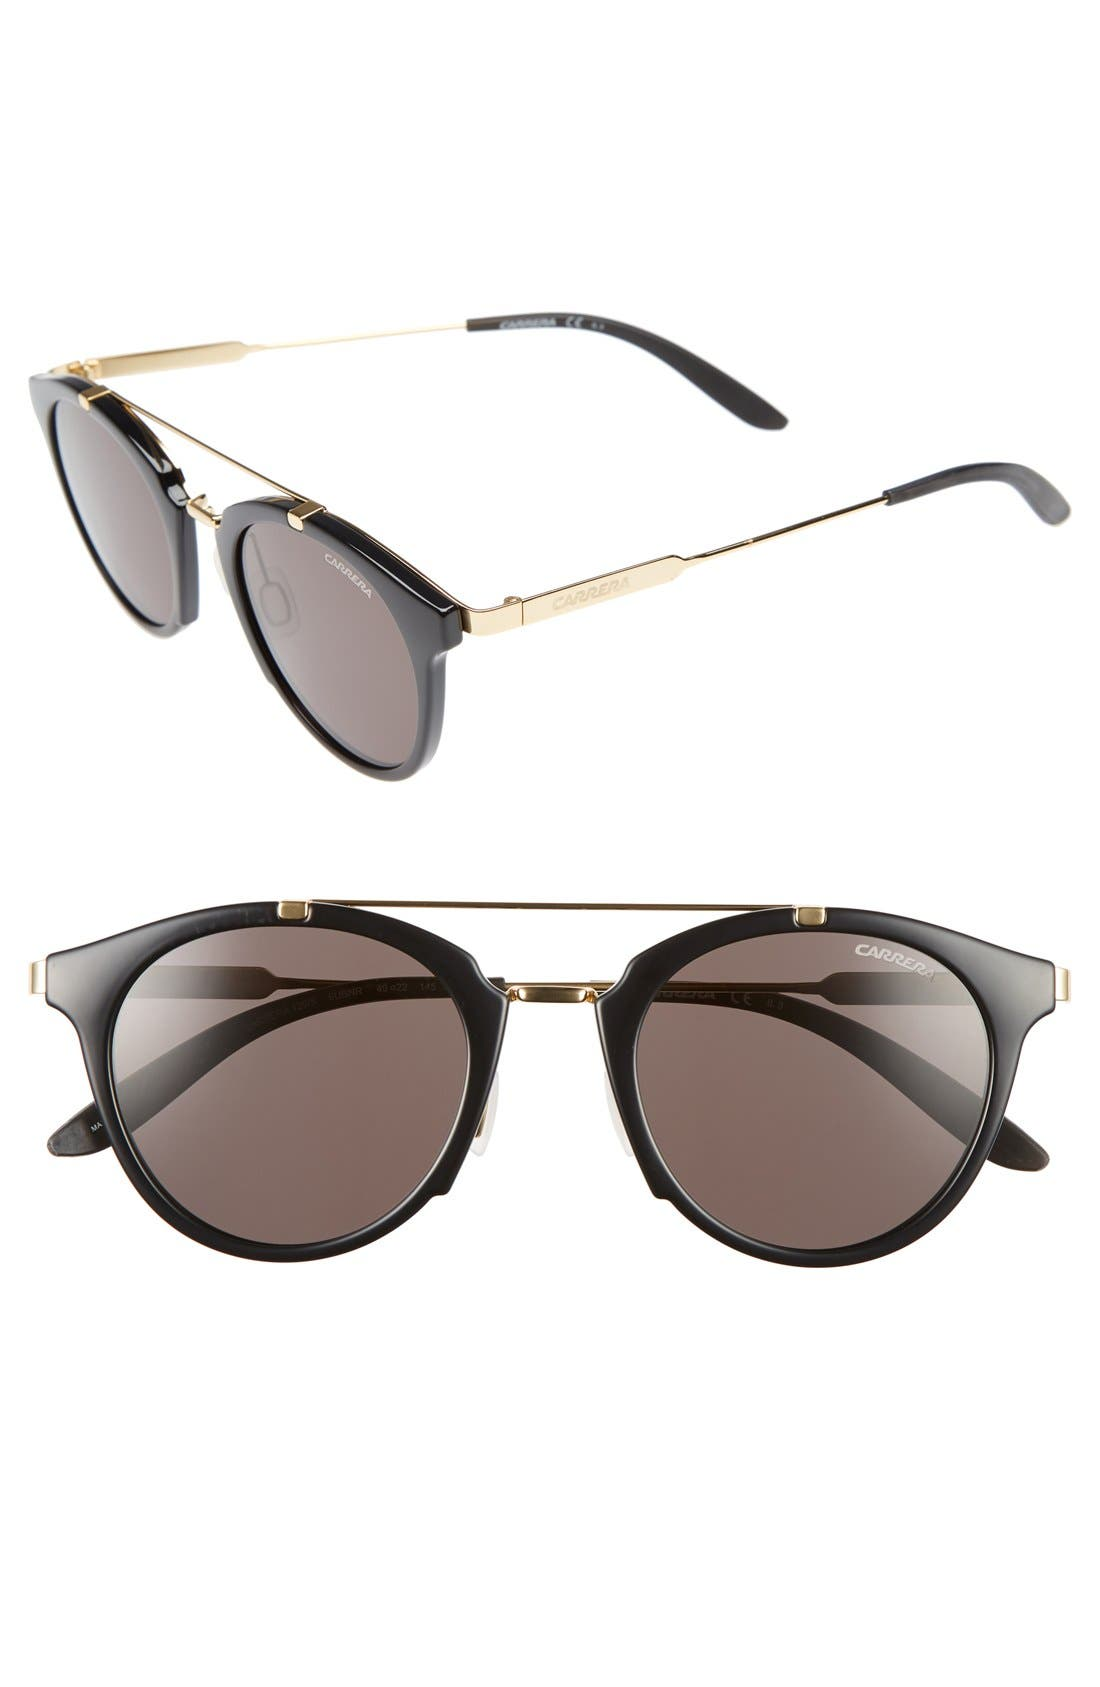 Carrera 126 49mm Sunglasses,                         Main,                         color, 001